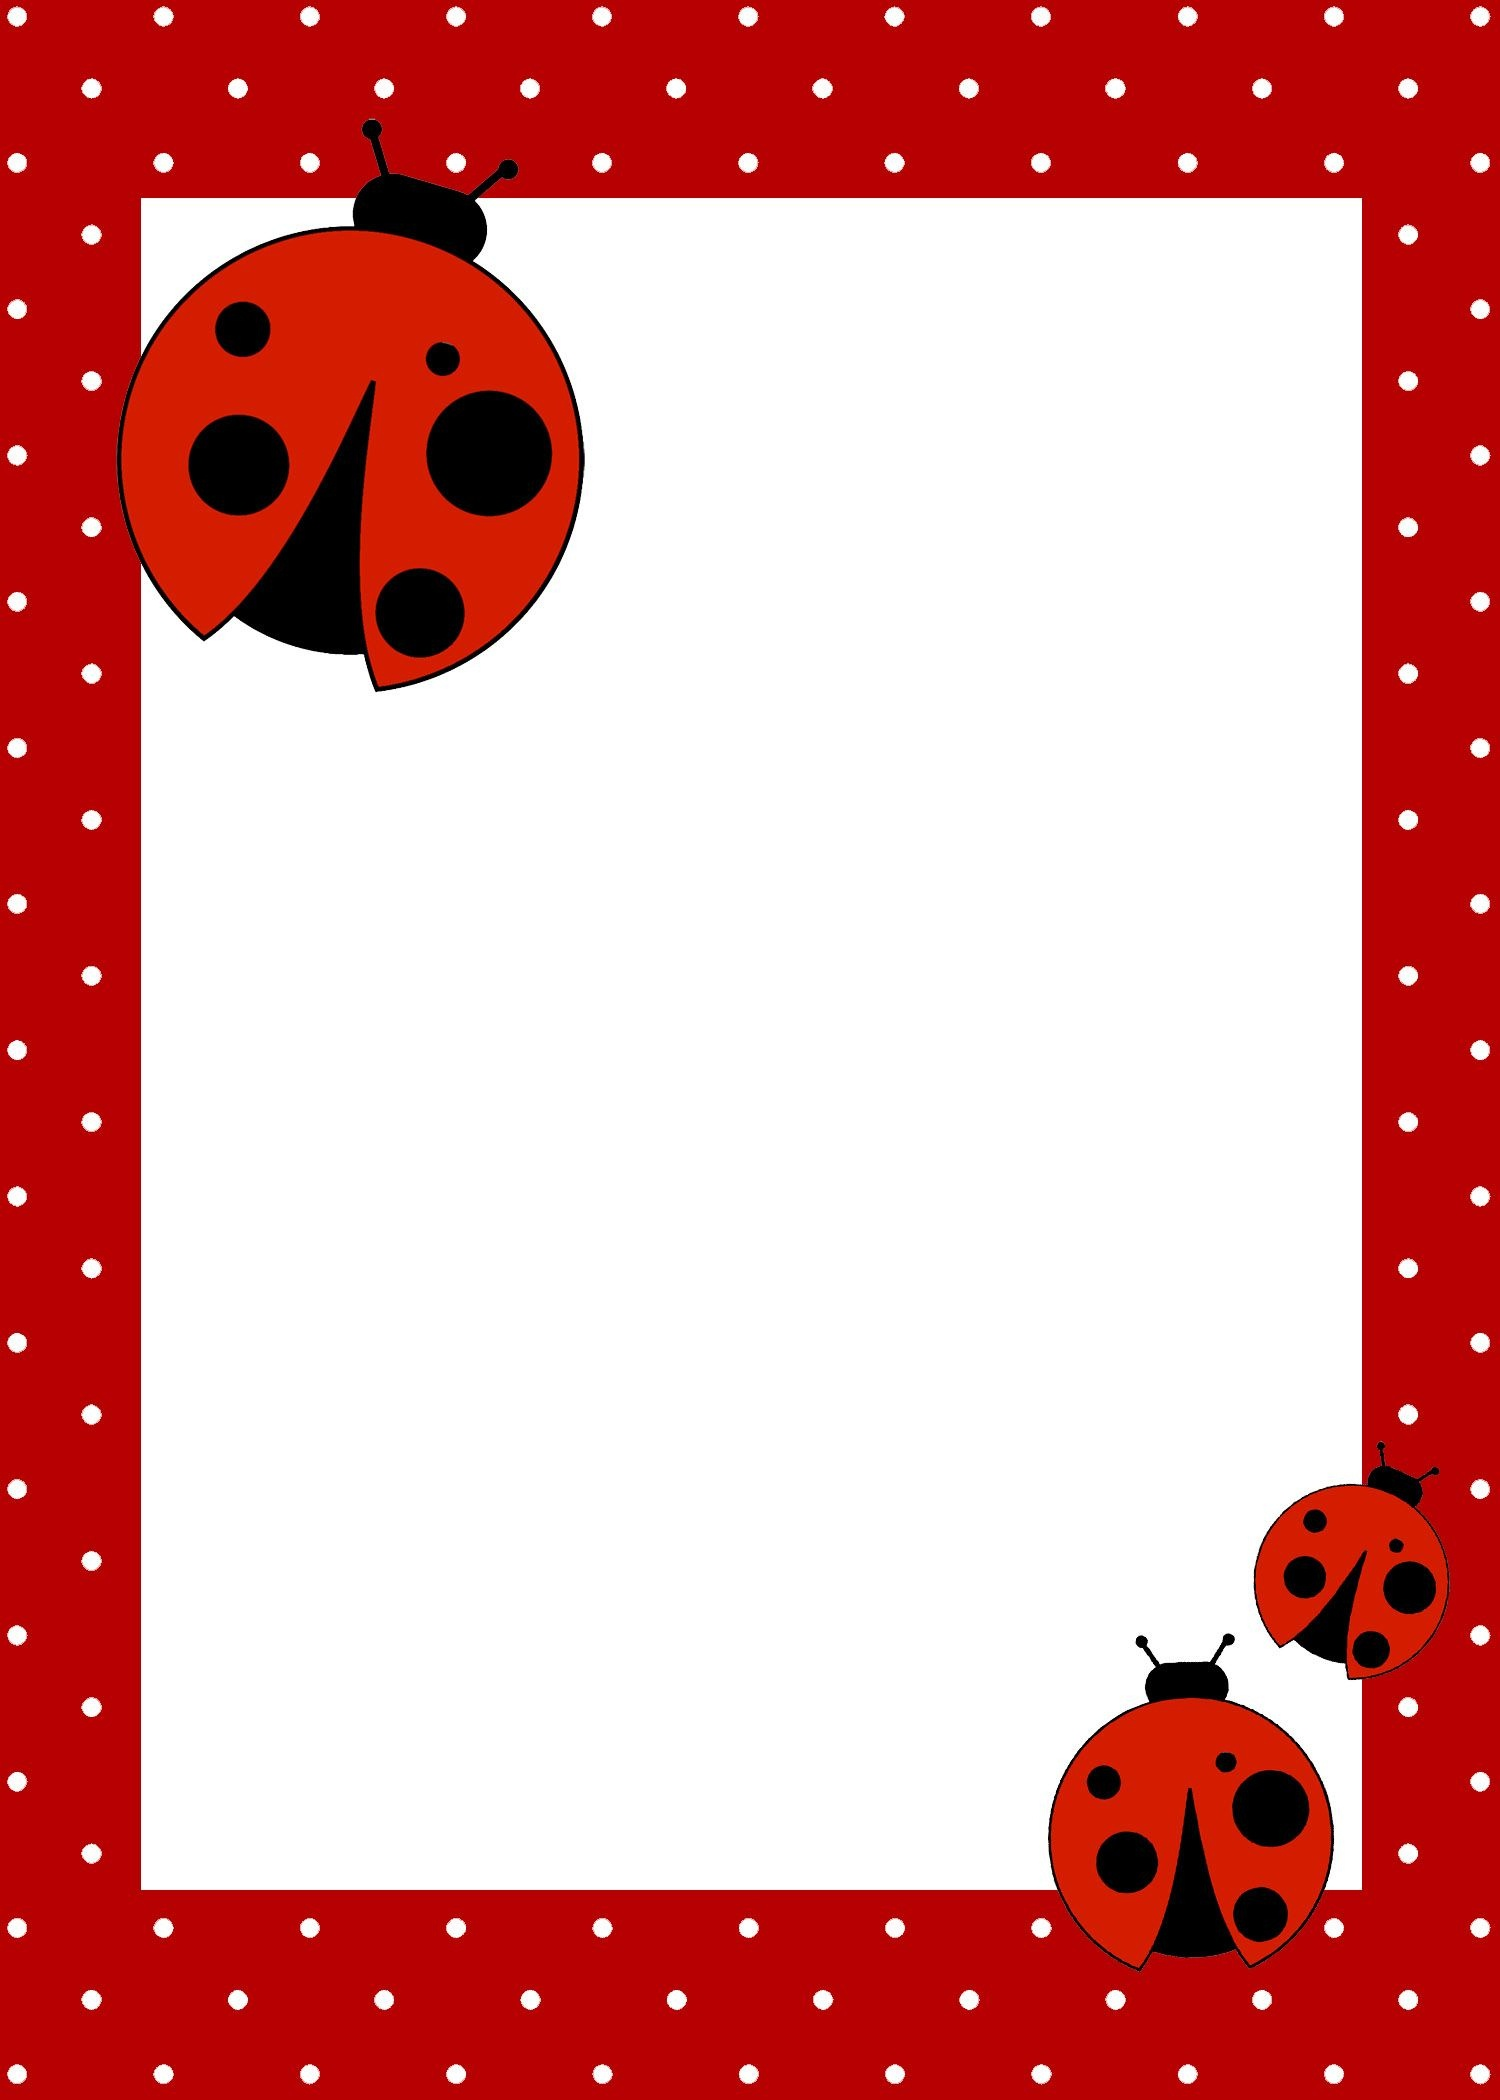 Ladybug Birthday Party With Free Printables | Lienky | Ladybug - Free Printable Ladybug Invitations